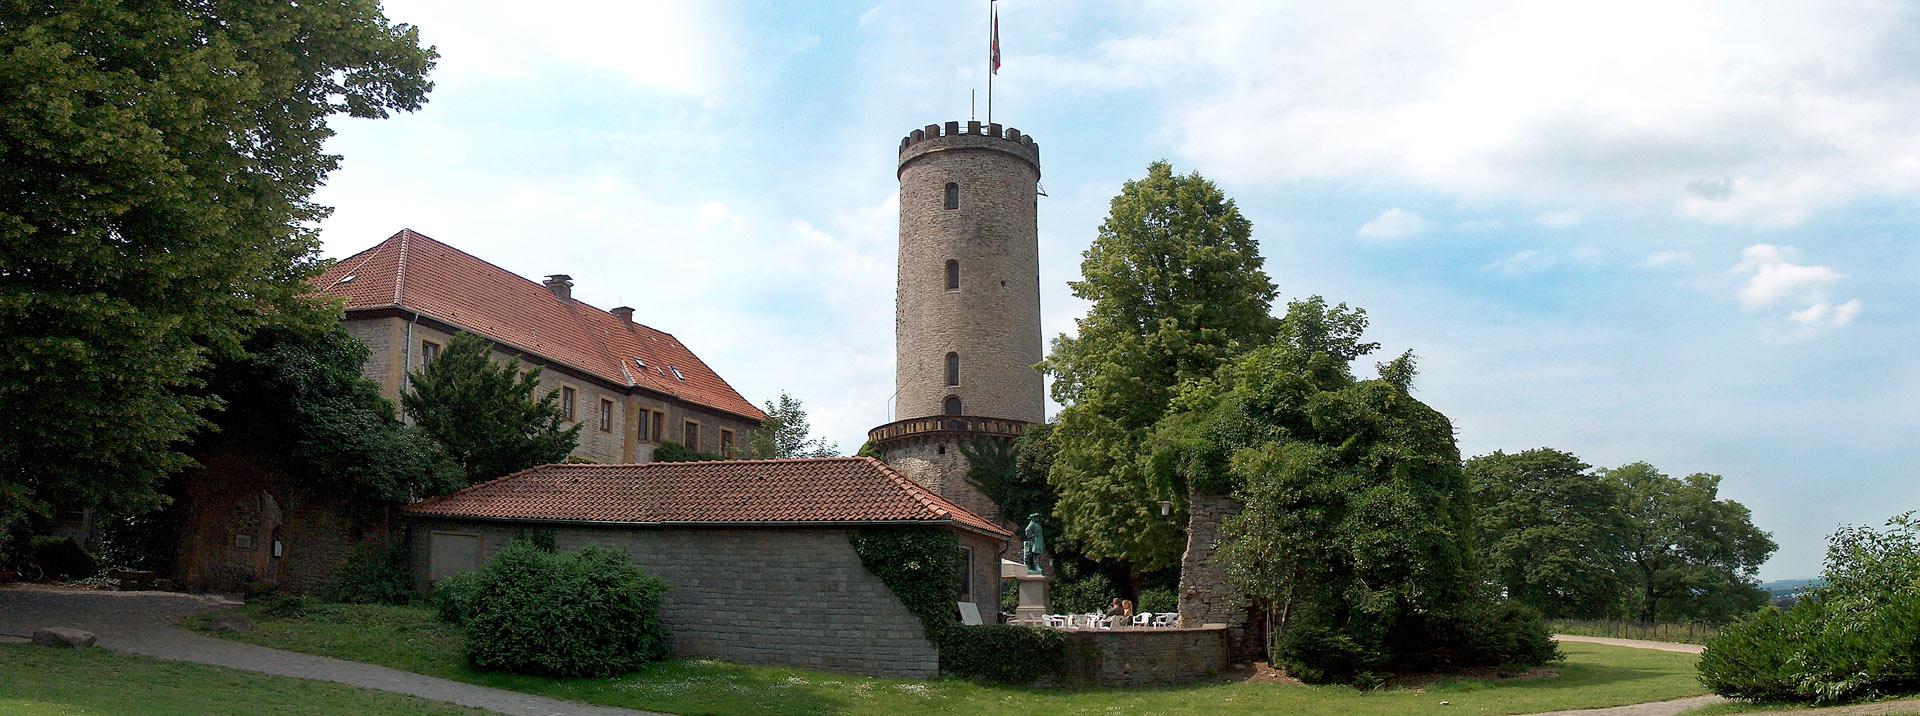 Sparrenburg Bielefeld 2008